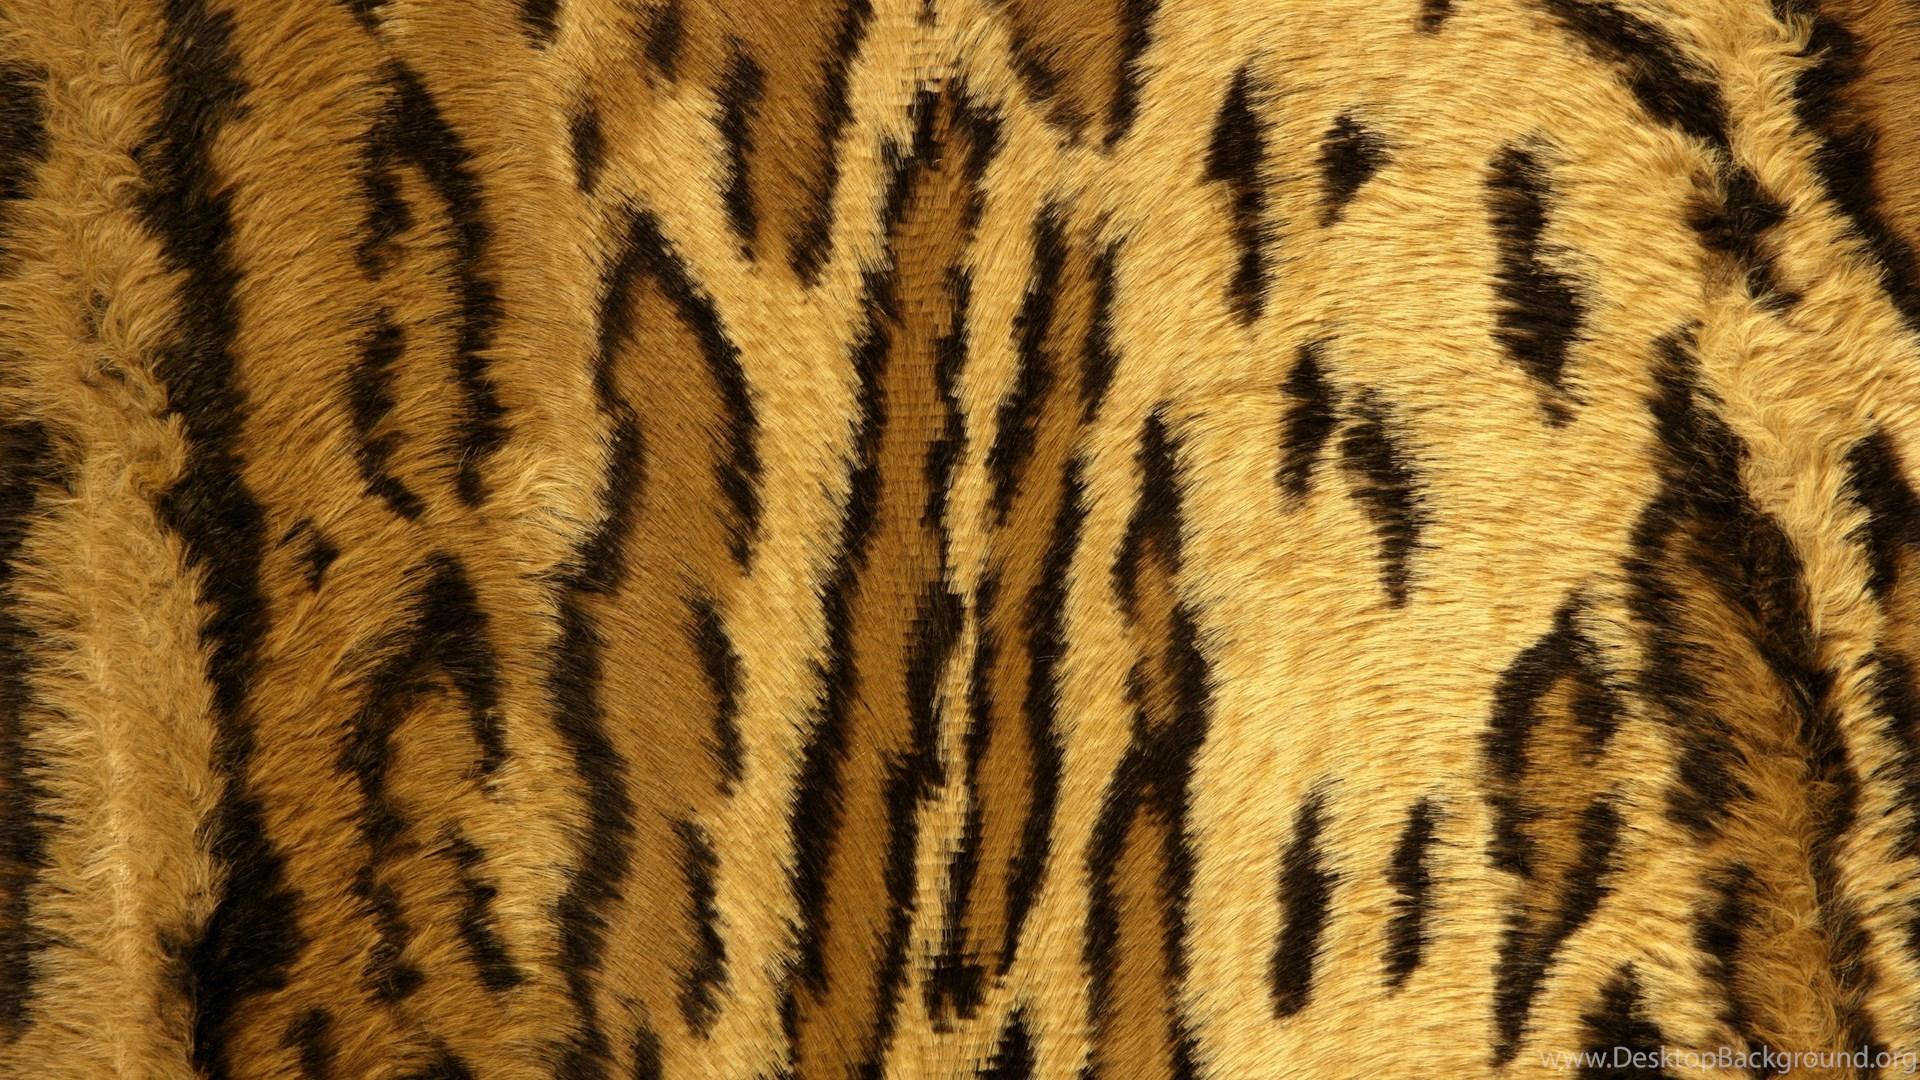 Cheetah print tumblr background